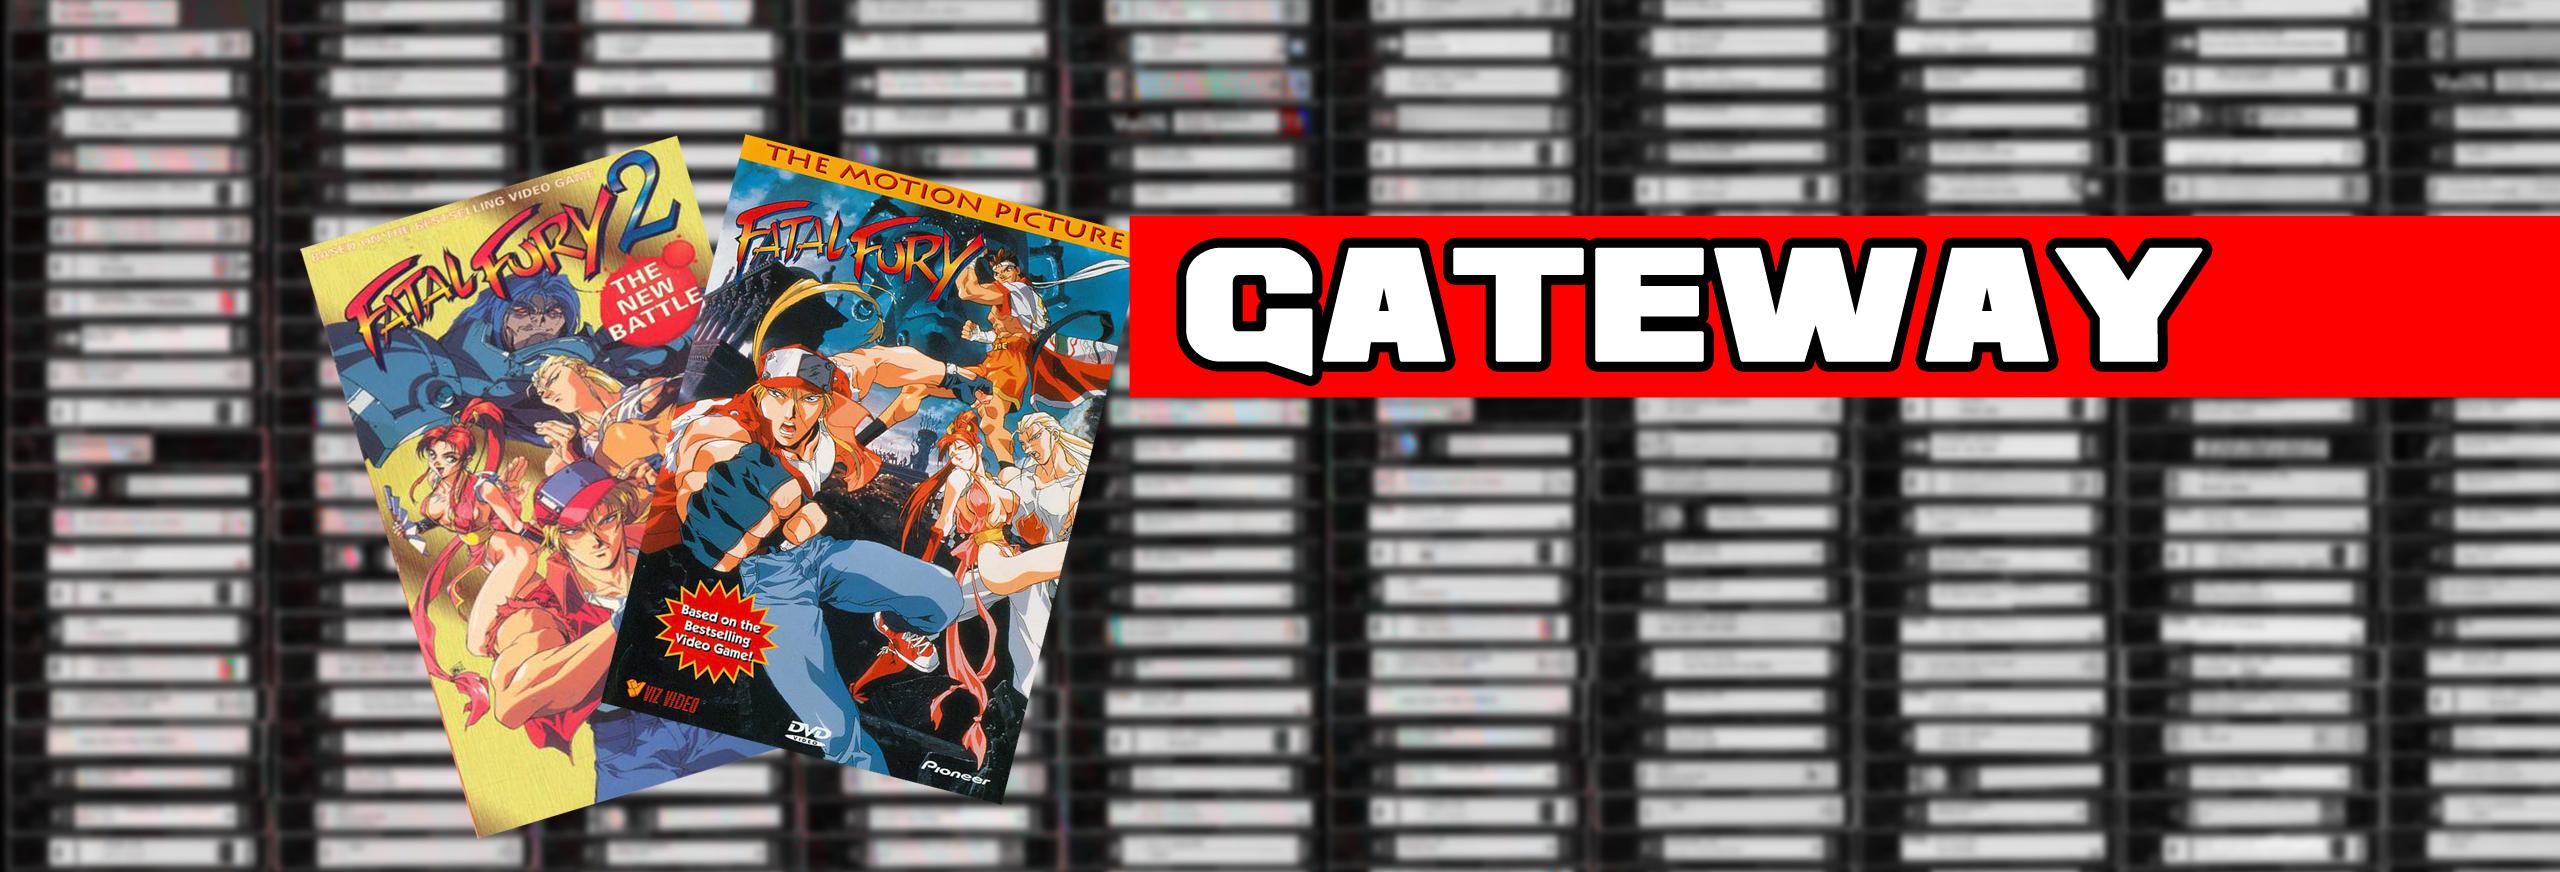 Gateway fatal fury movies anifile anime reviews